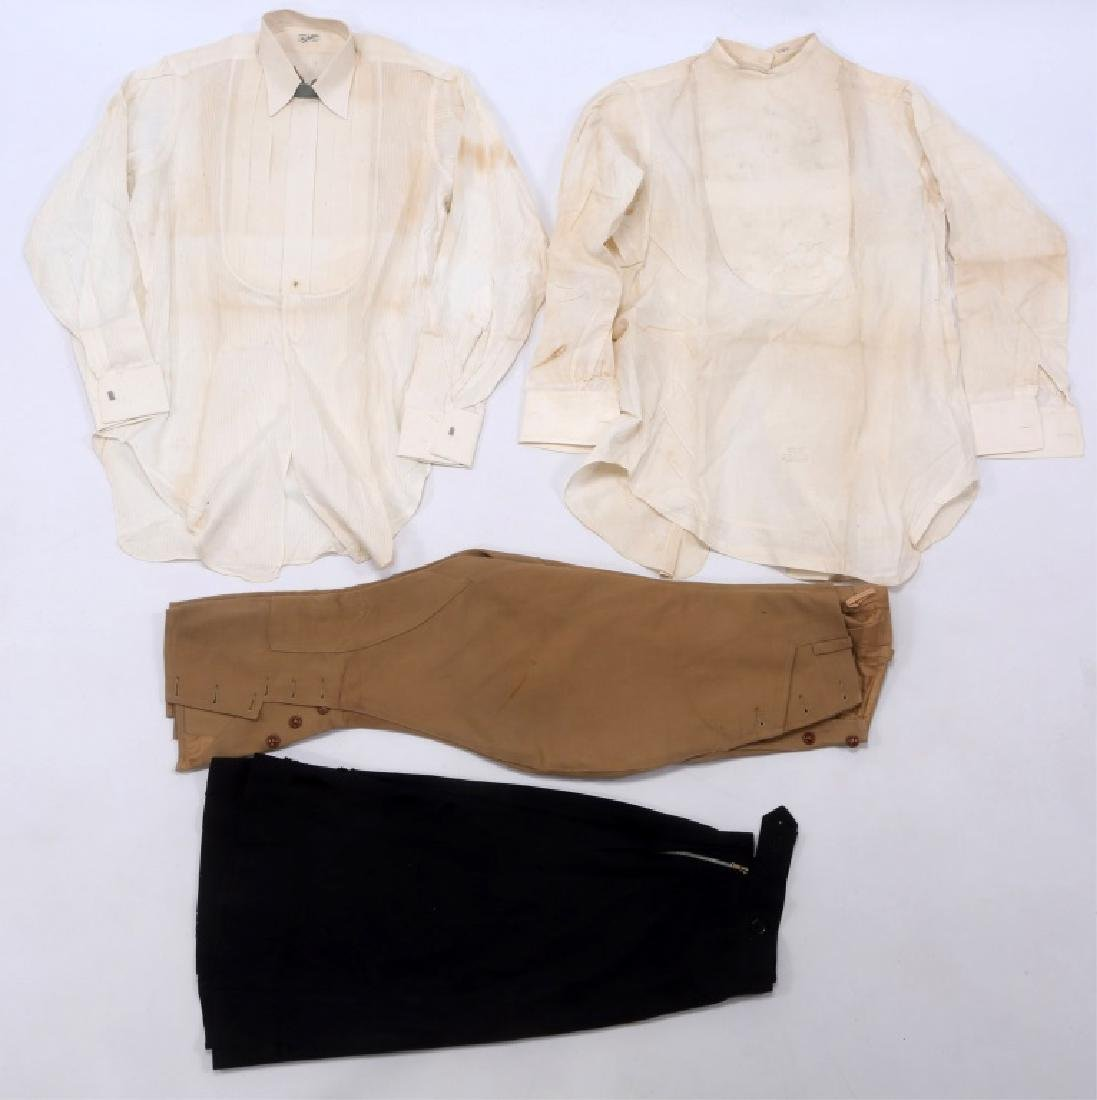 19th CENTURY WORLD MILITARY DRESS UNIFORM LOT - 5